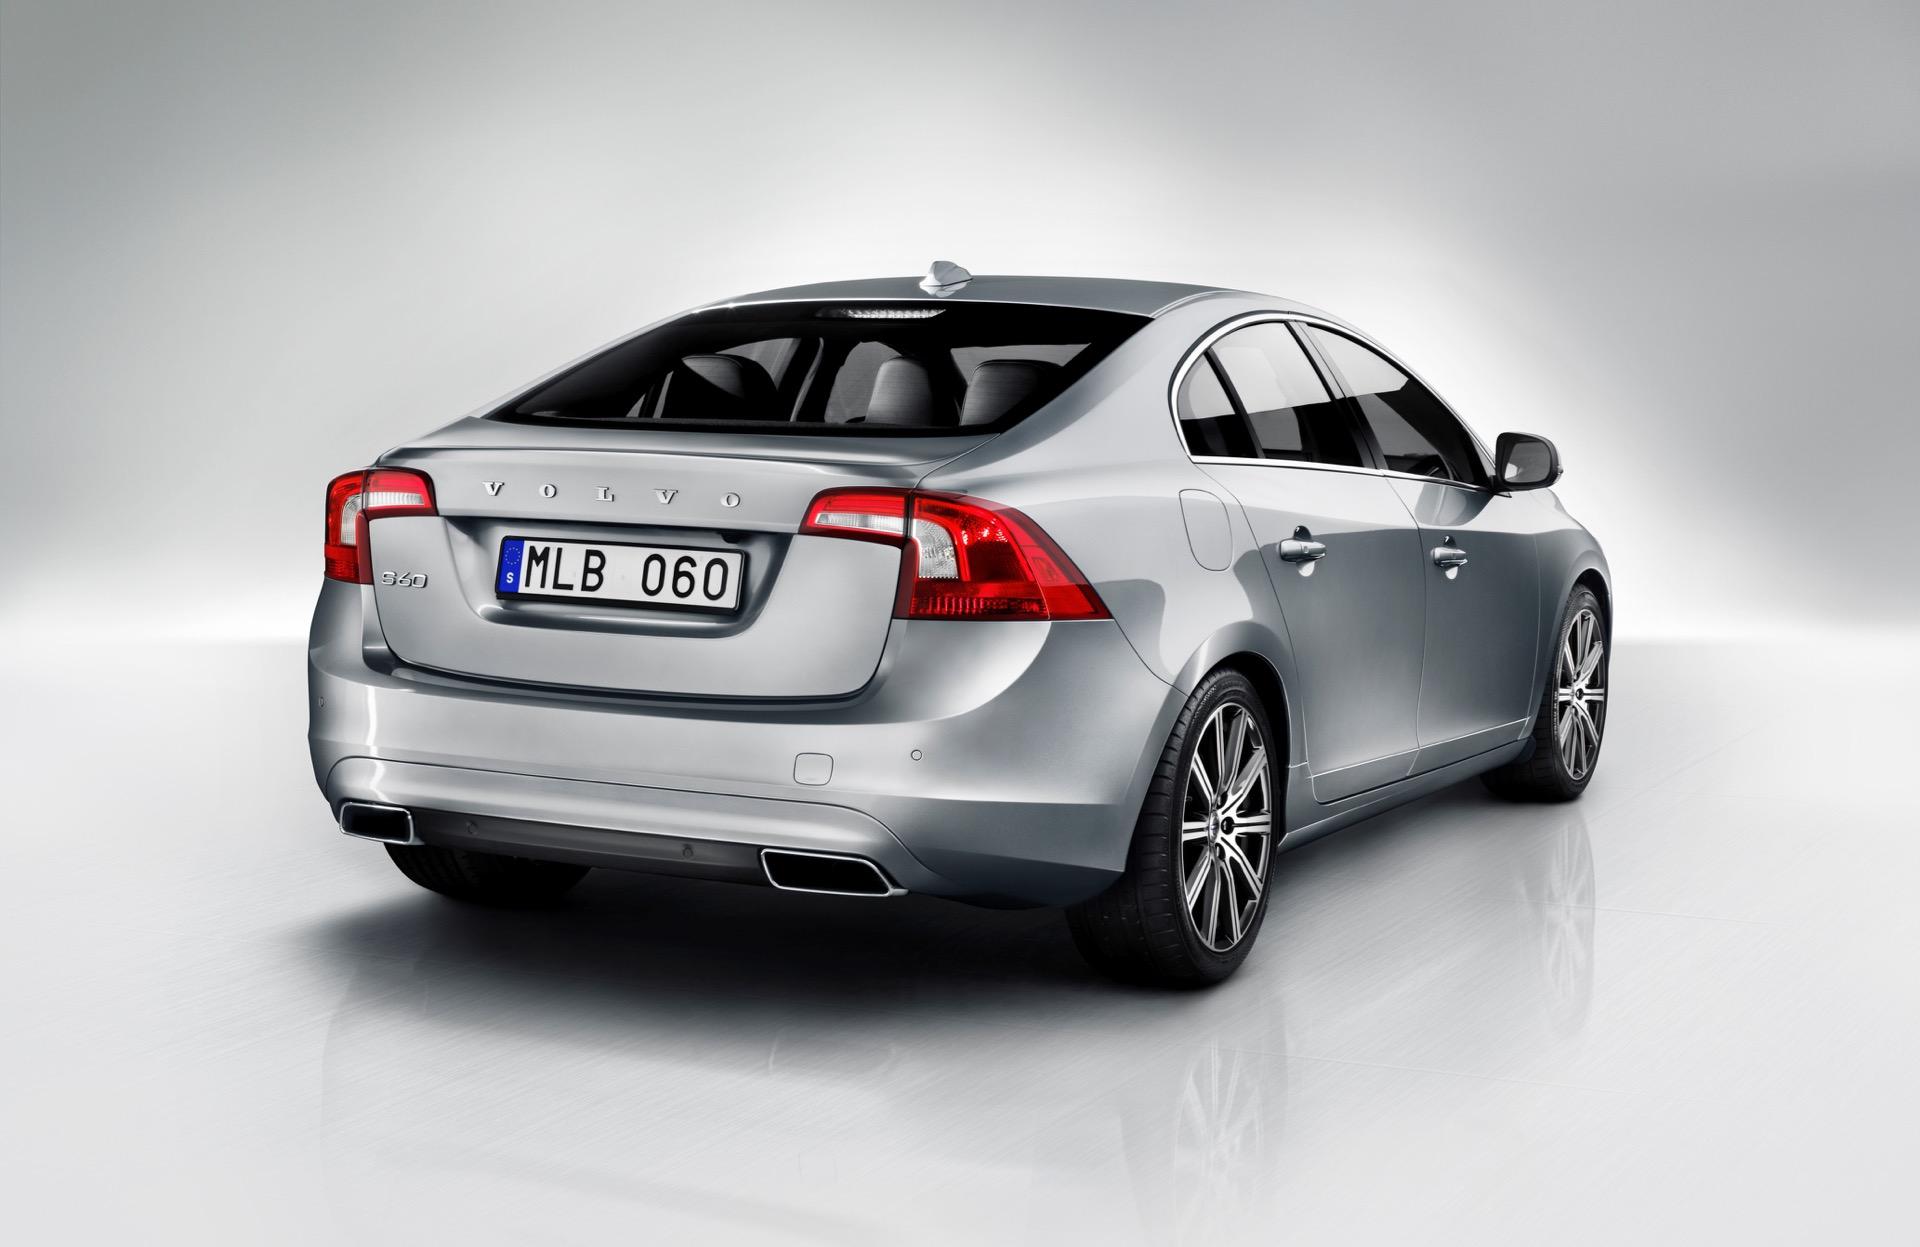 Volvo S60 -  2013, 2014, Exterior, Images, S60, Volvo